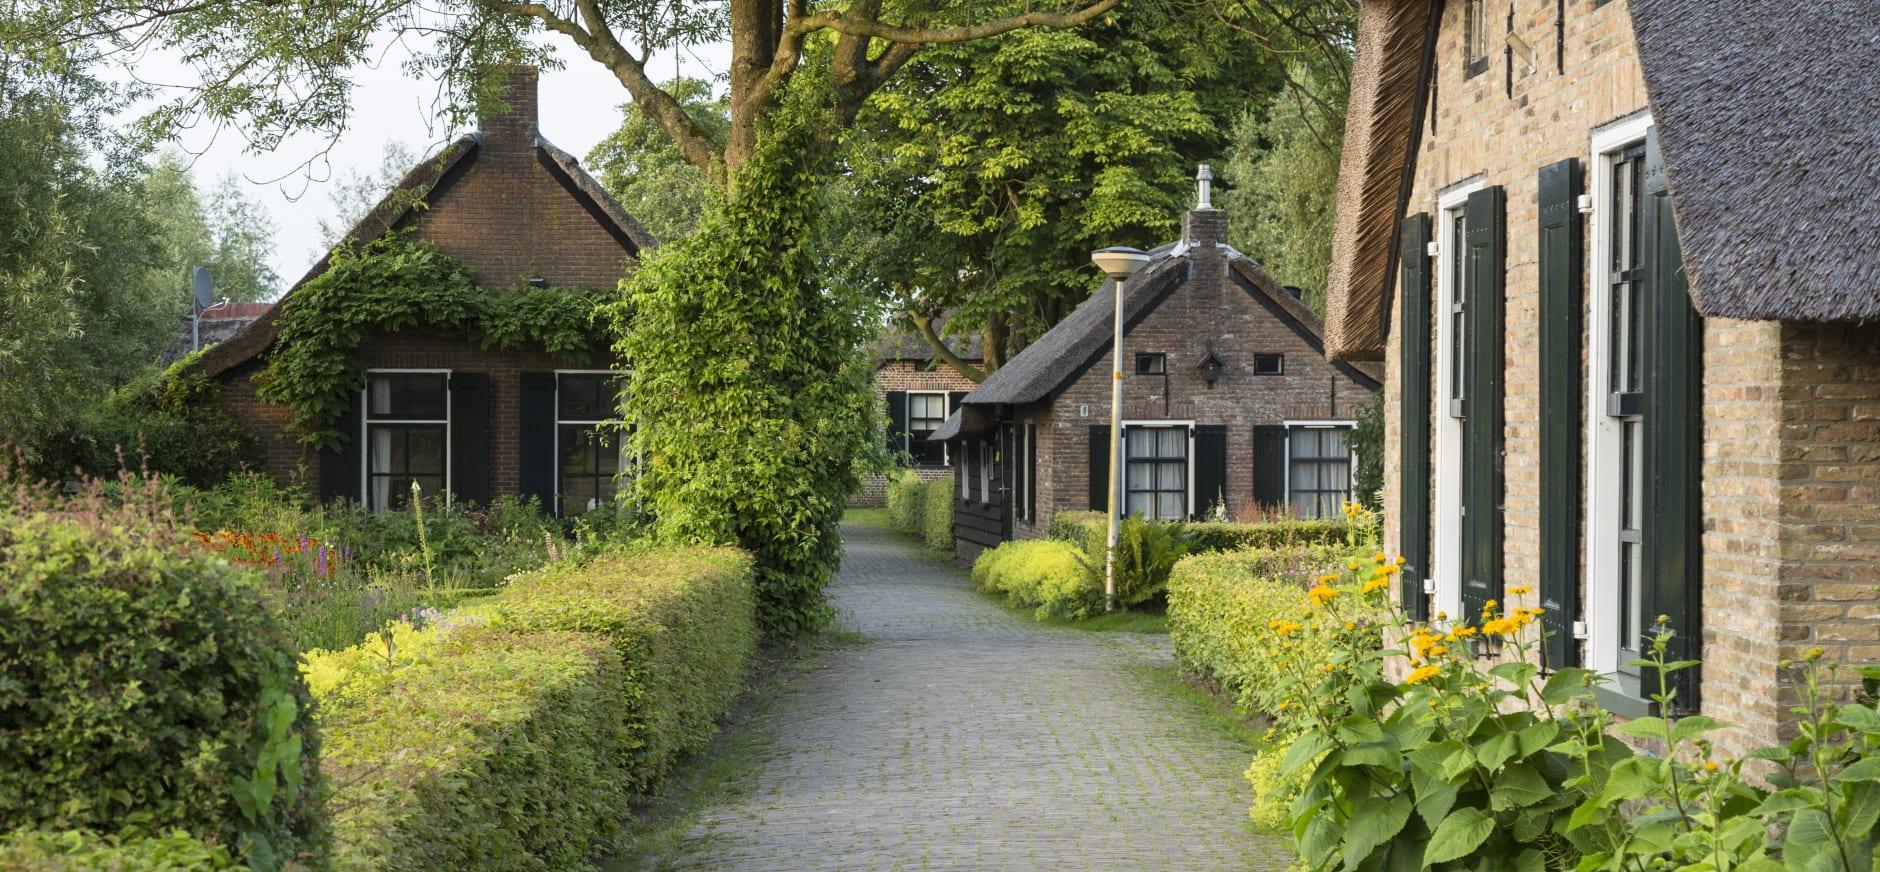 Beulakerpad Sint Jansklooster